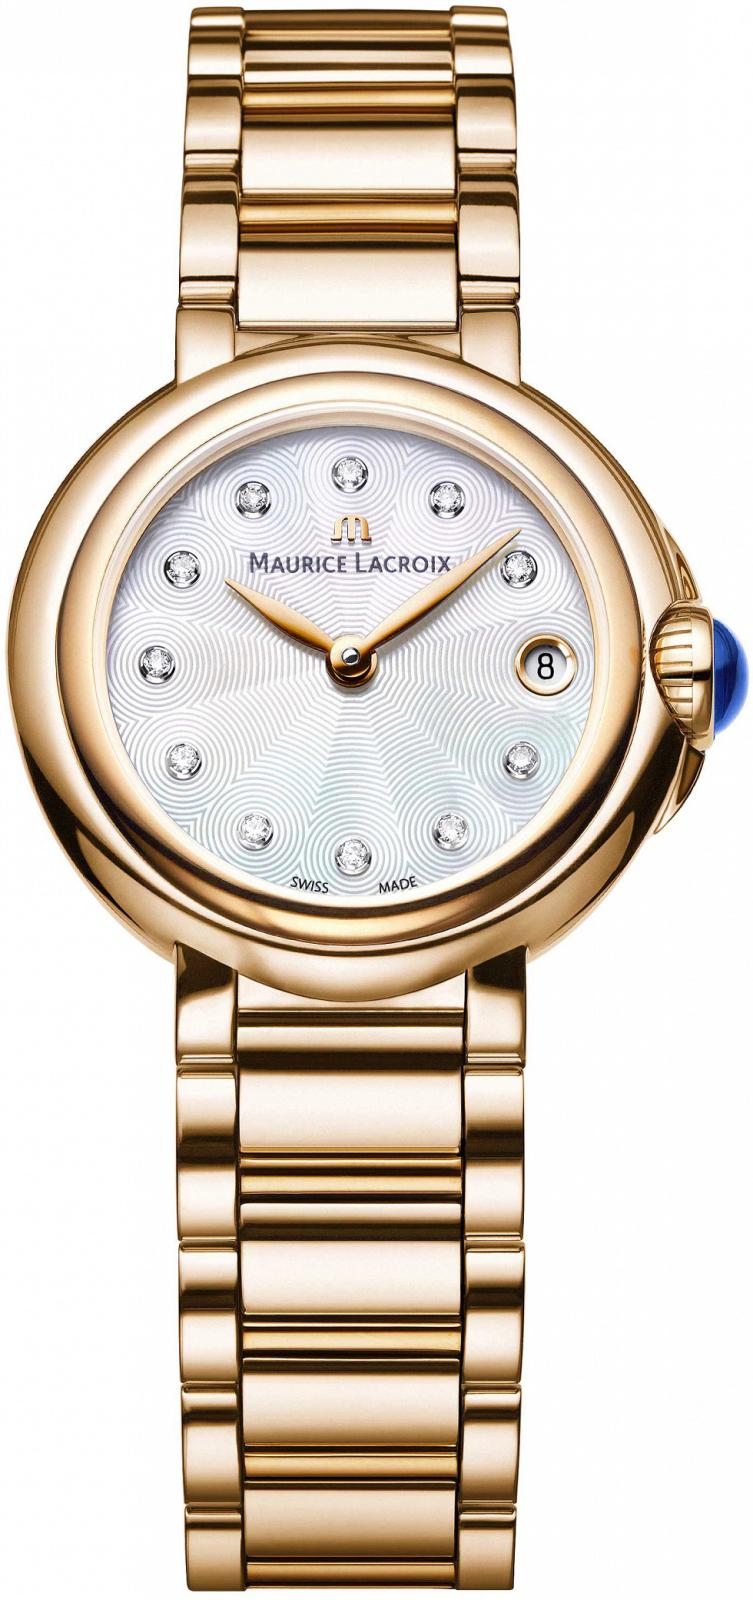 Maurice Lacroix FA1003-PVP06-170-1 от Maurice Lacroix